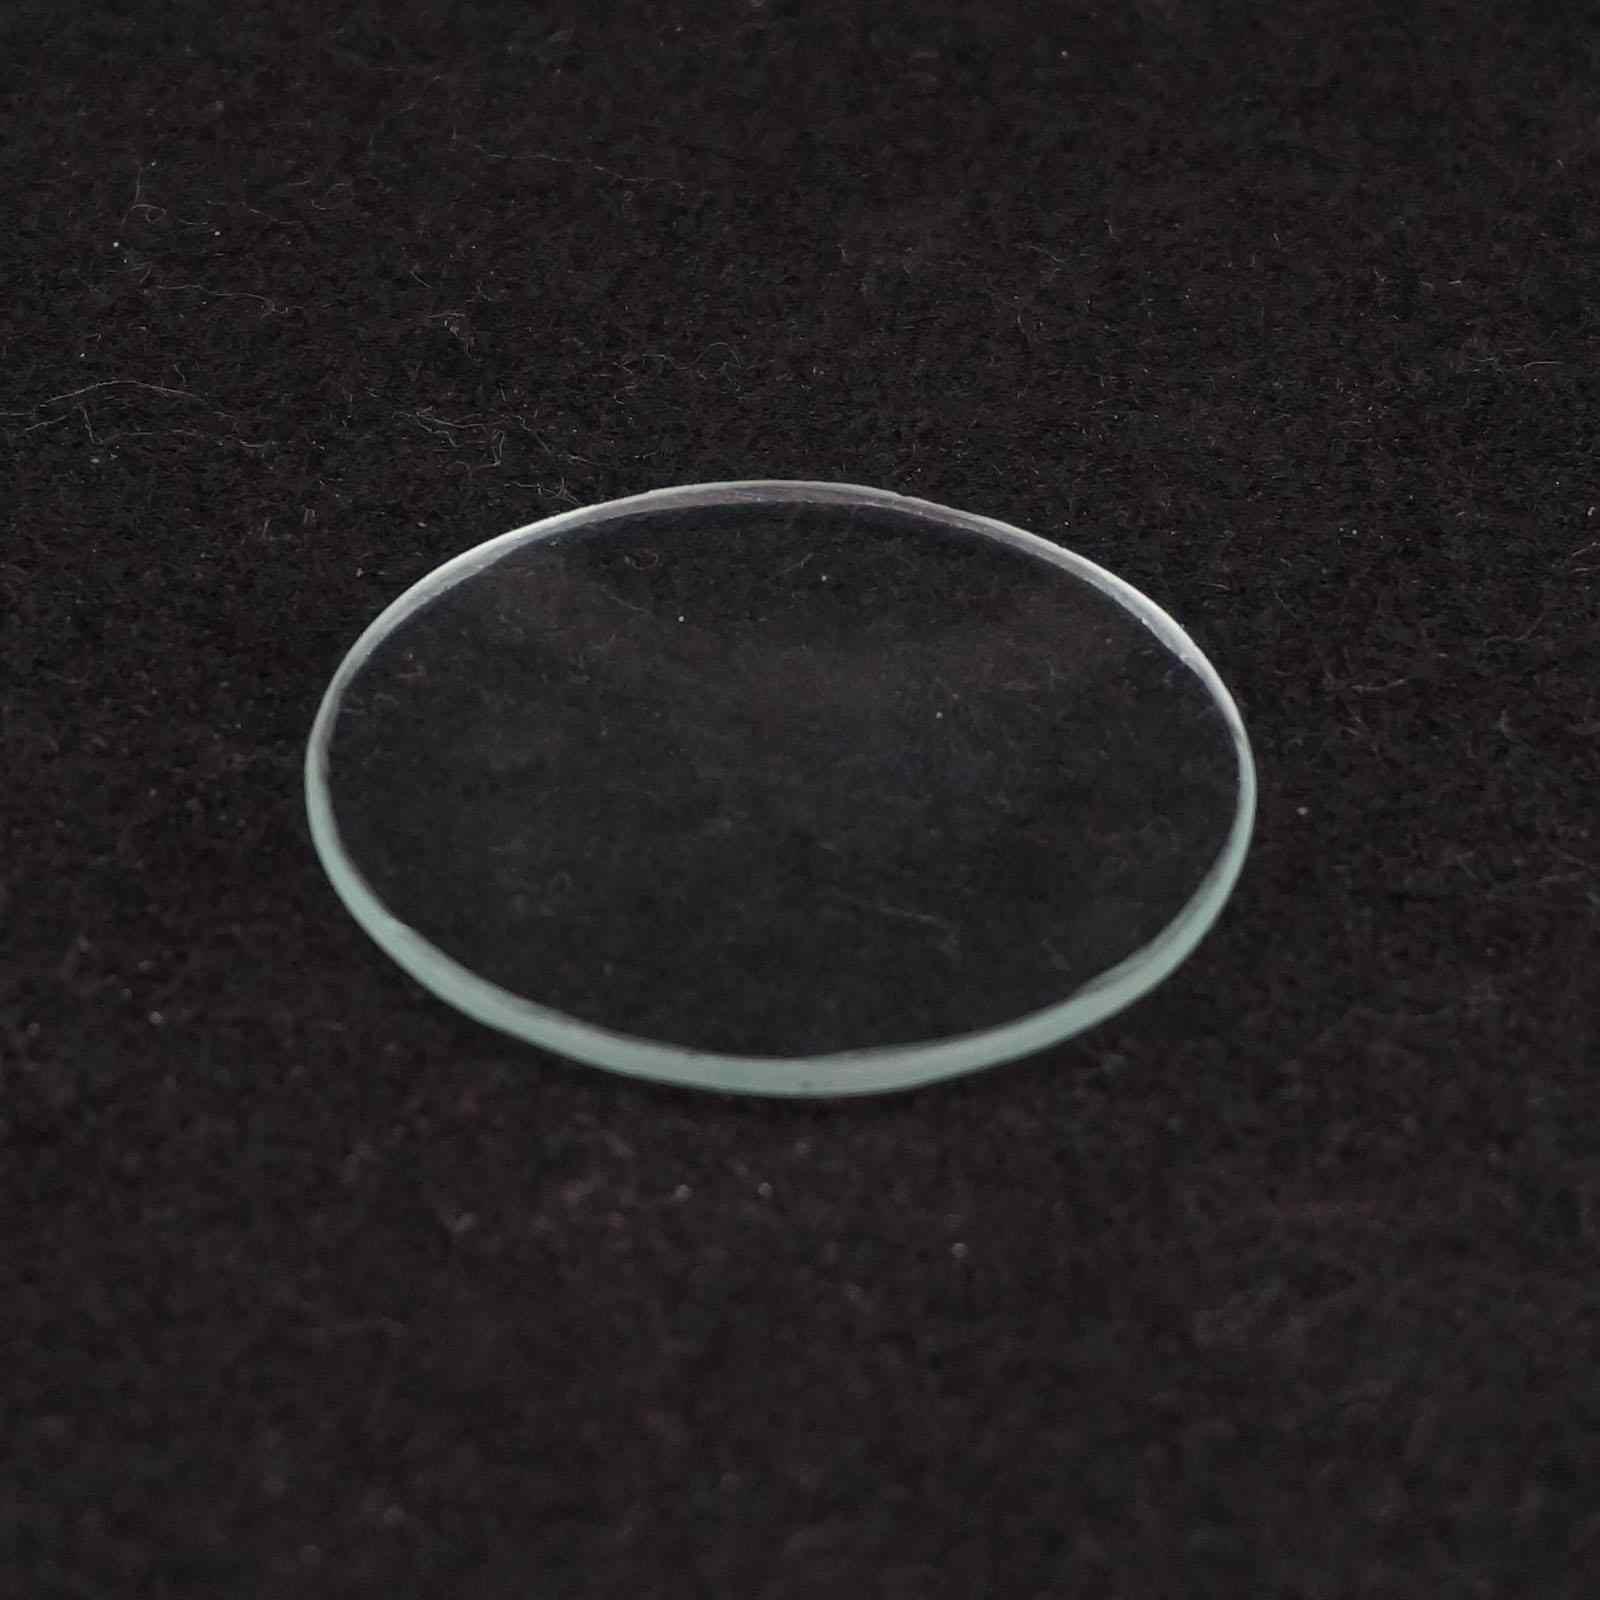 45mm O.D นาฬิกา Domed Hard Beaker ฝาครอบอุปกรณ์ Lab Chemical Experiment